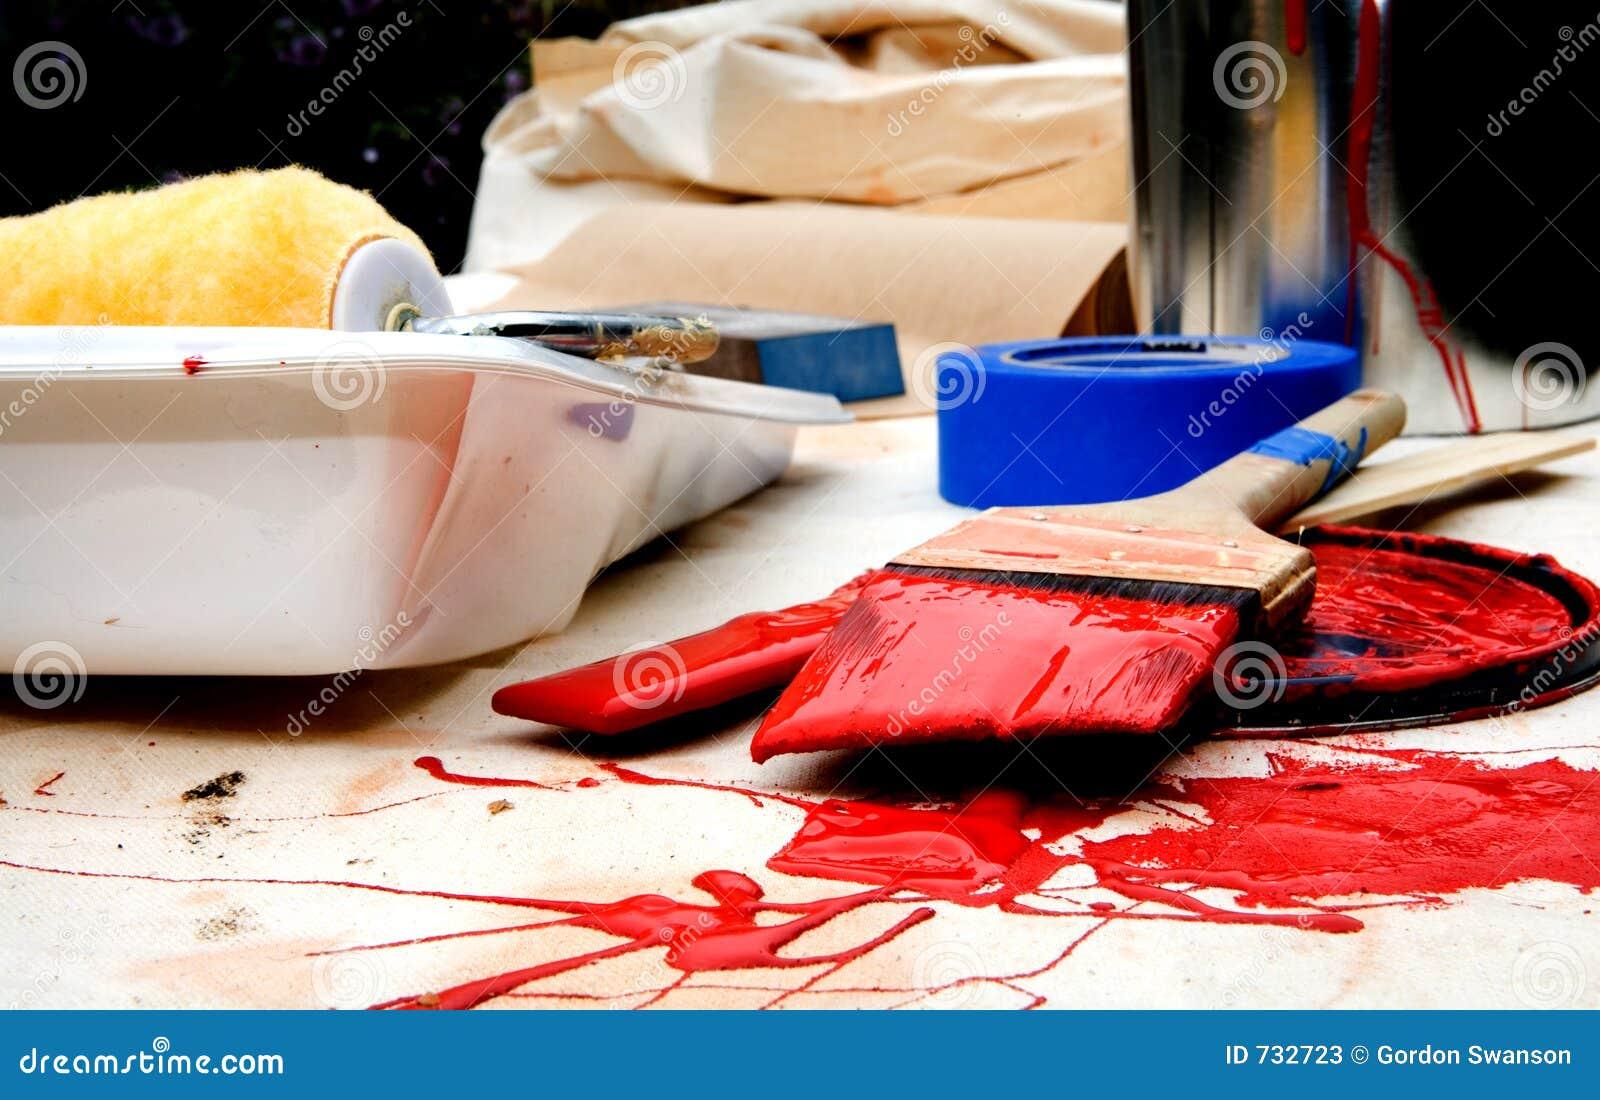 Peinture en rouge